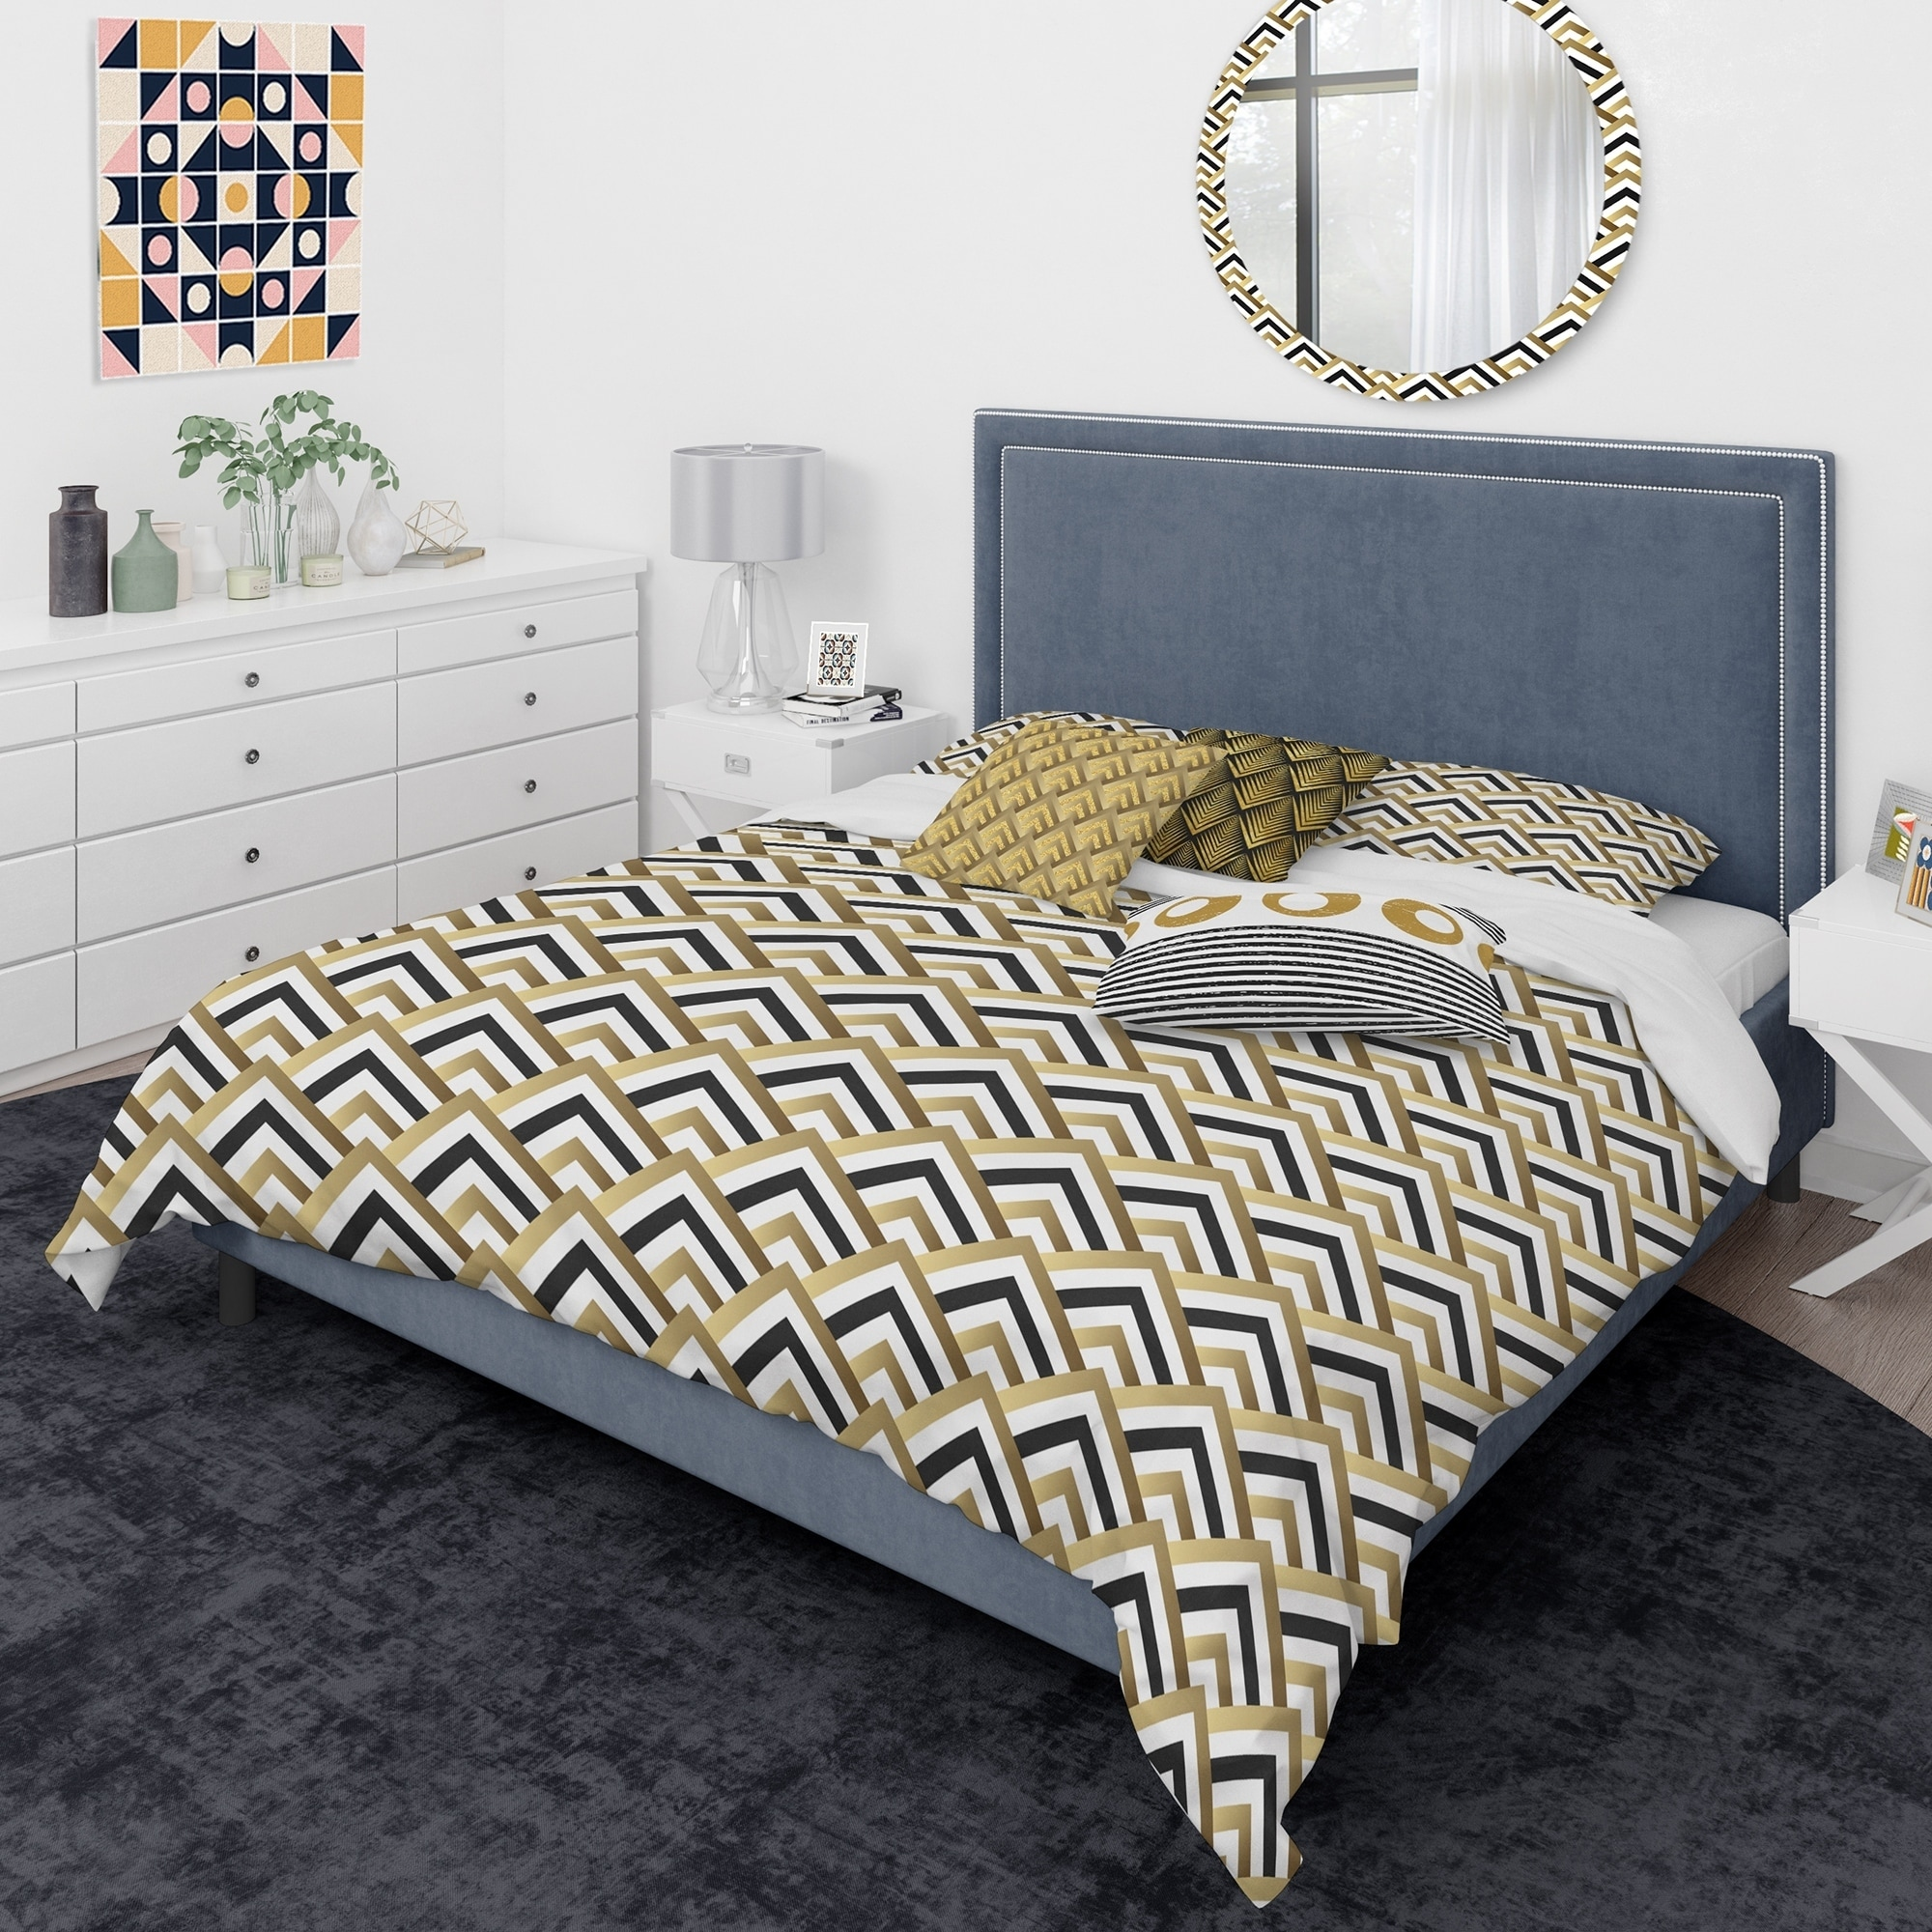 Designart Gold Black And White Triangle Mid Century Modern Duvet Cover Comforter Set Overstock 29257796